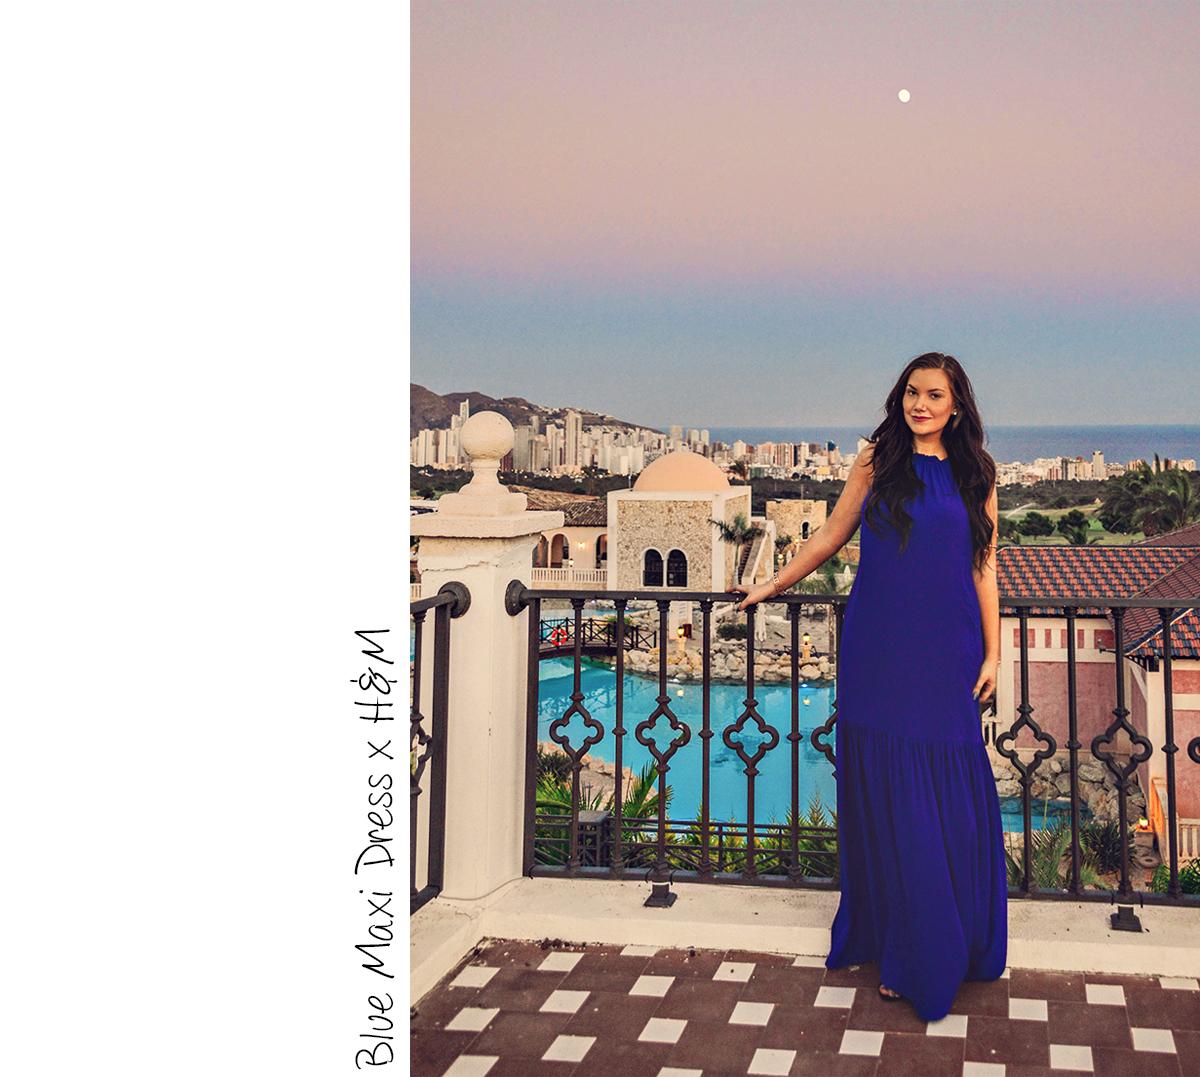 Blue Maxi Dress in Benidorm